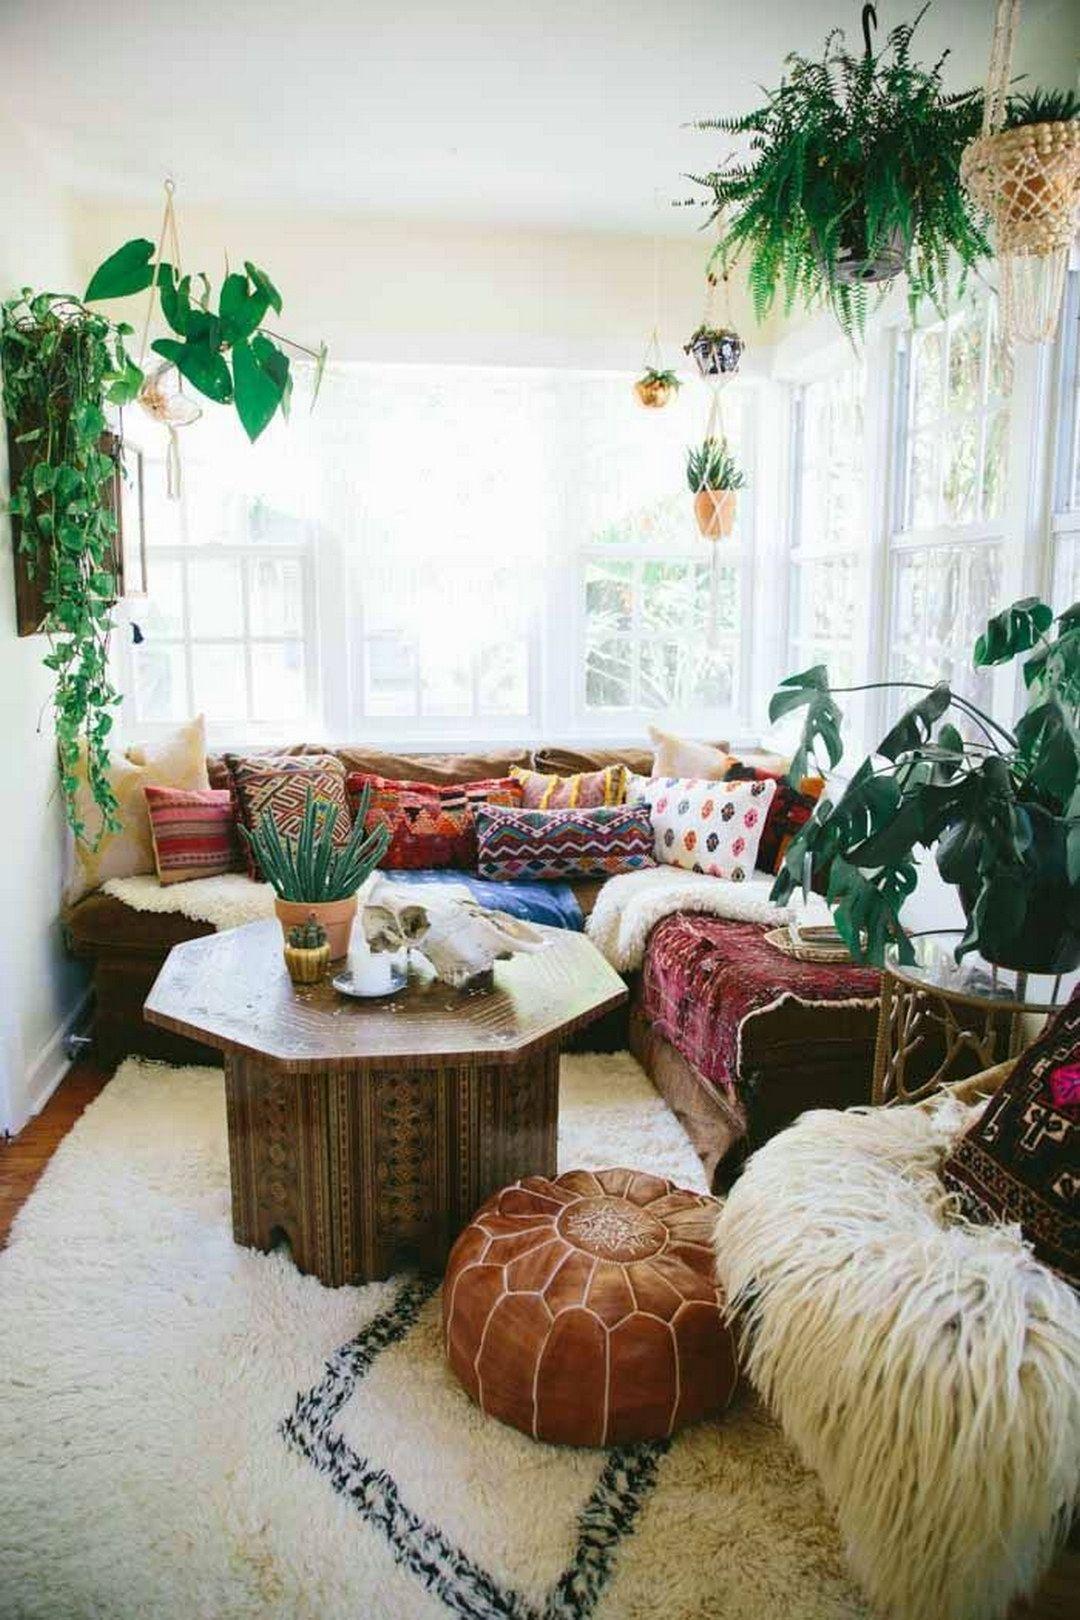 Home decor plants ideas   Top Bohemian Style Decor Tips with Adorable Interior Ideas